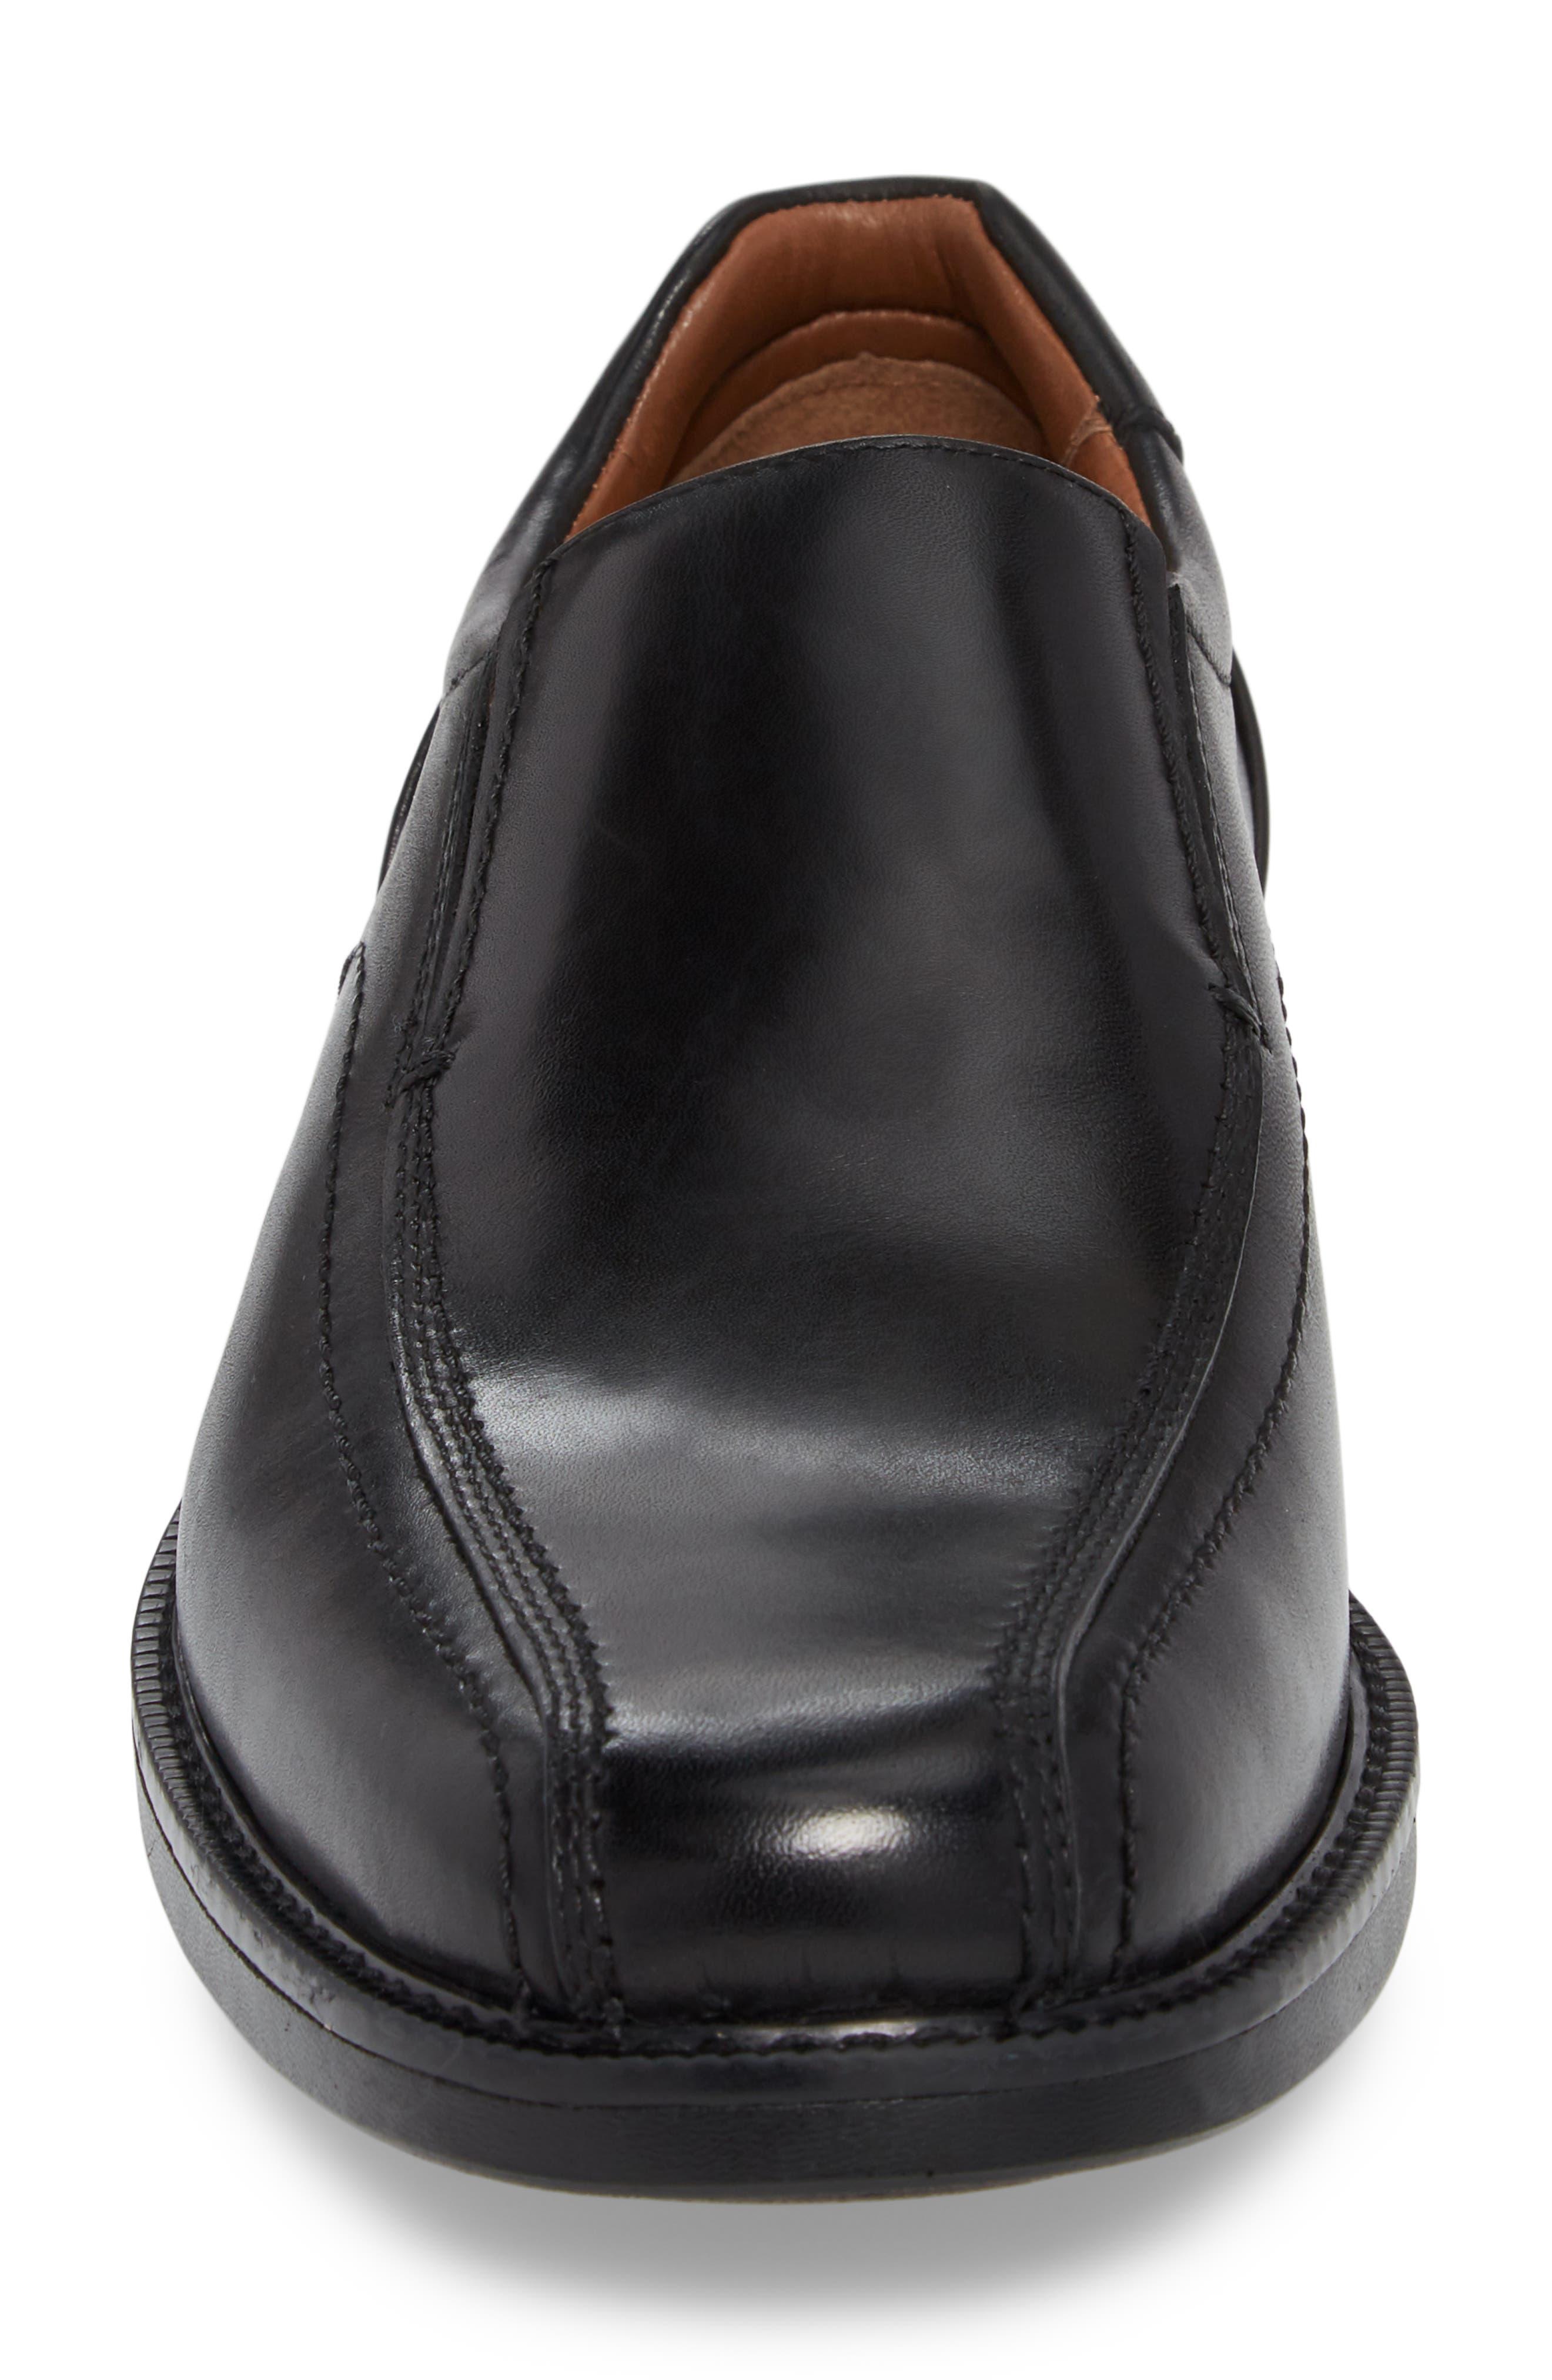 Stanton Runoff XC4<sup>®</sup> Bike Toe Slip-On,                             Alternate thumbnail 4, color,                             Black Leather